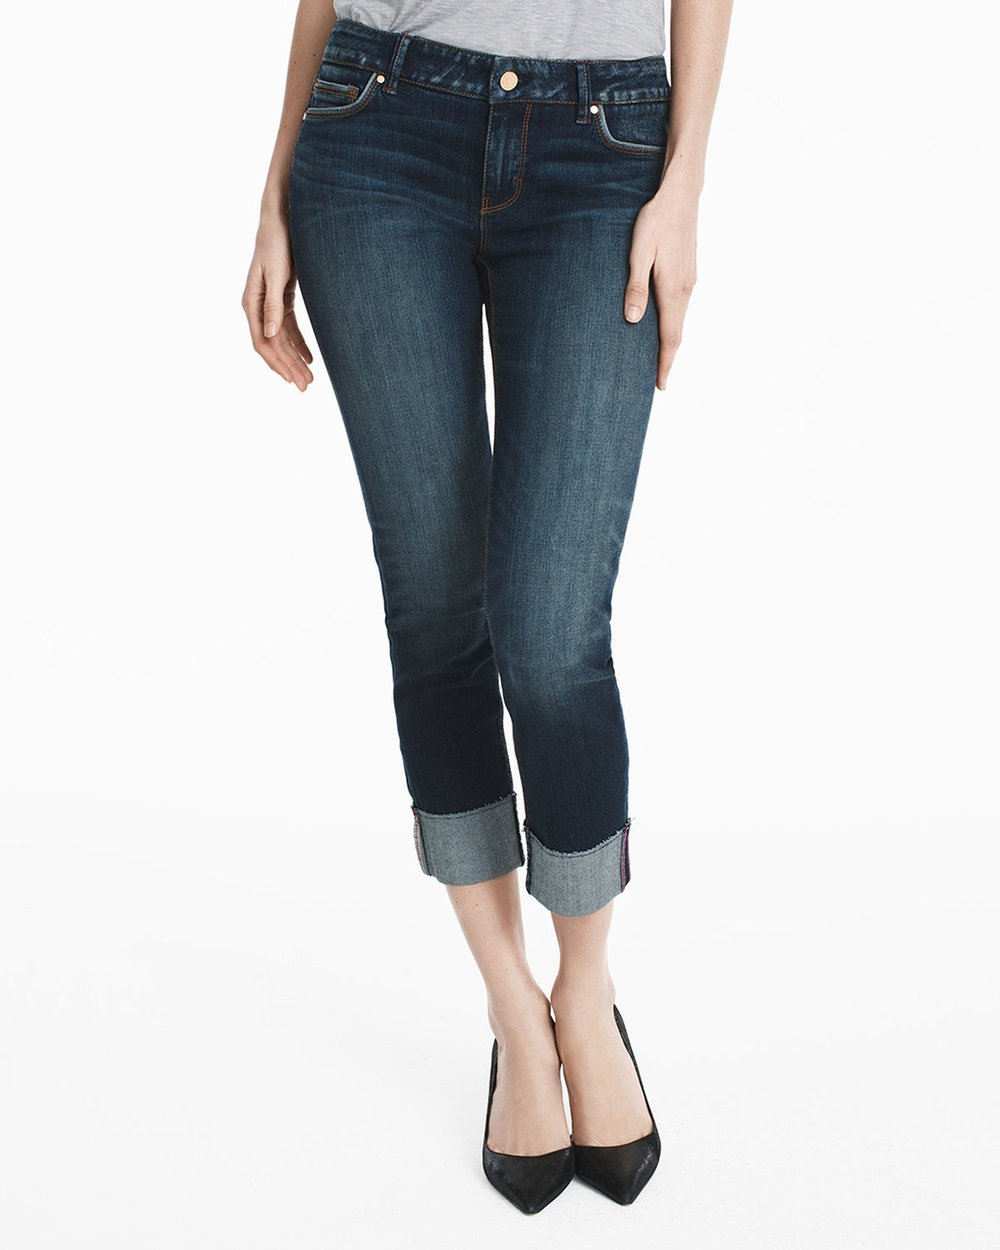 WHBM jeans.jpg